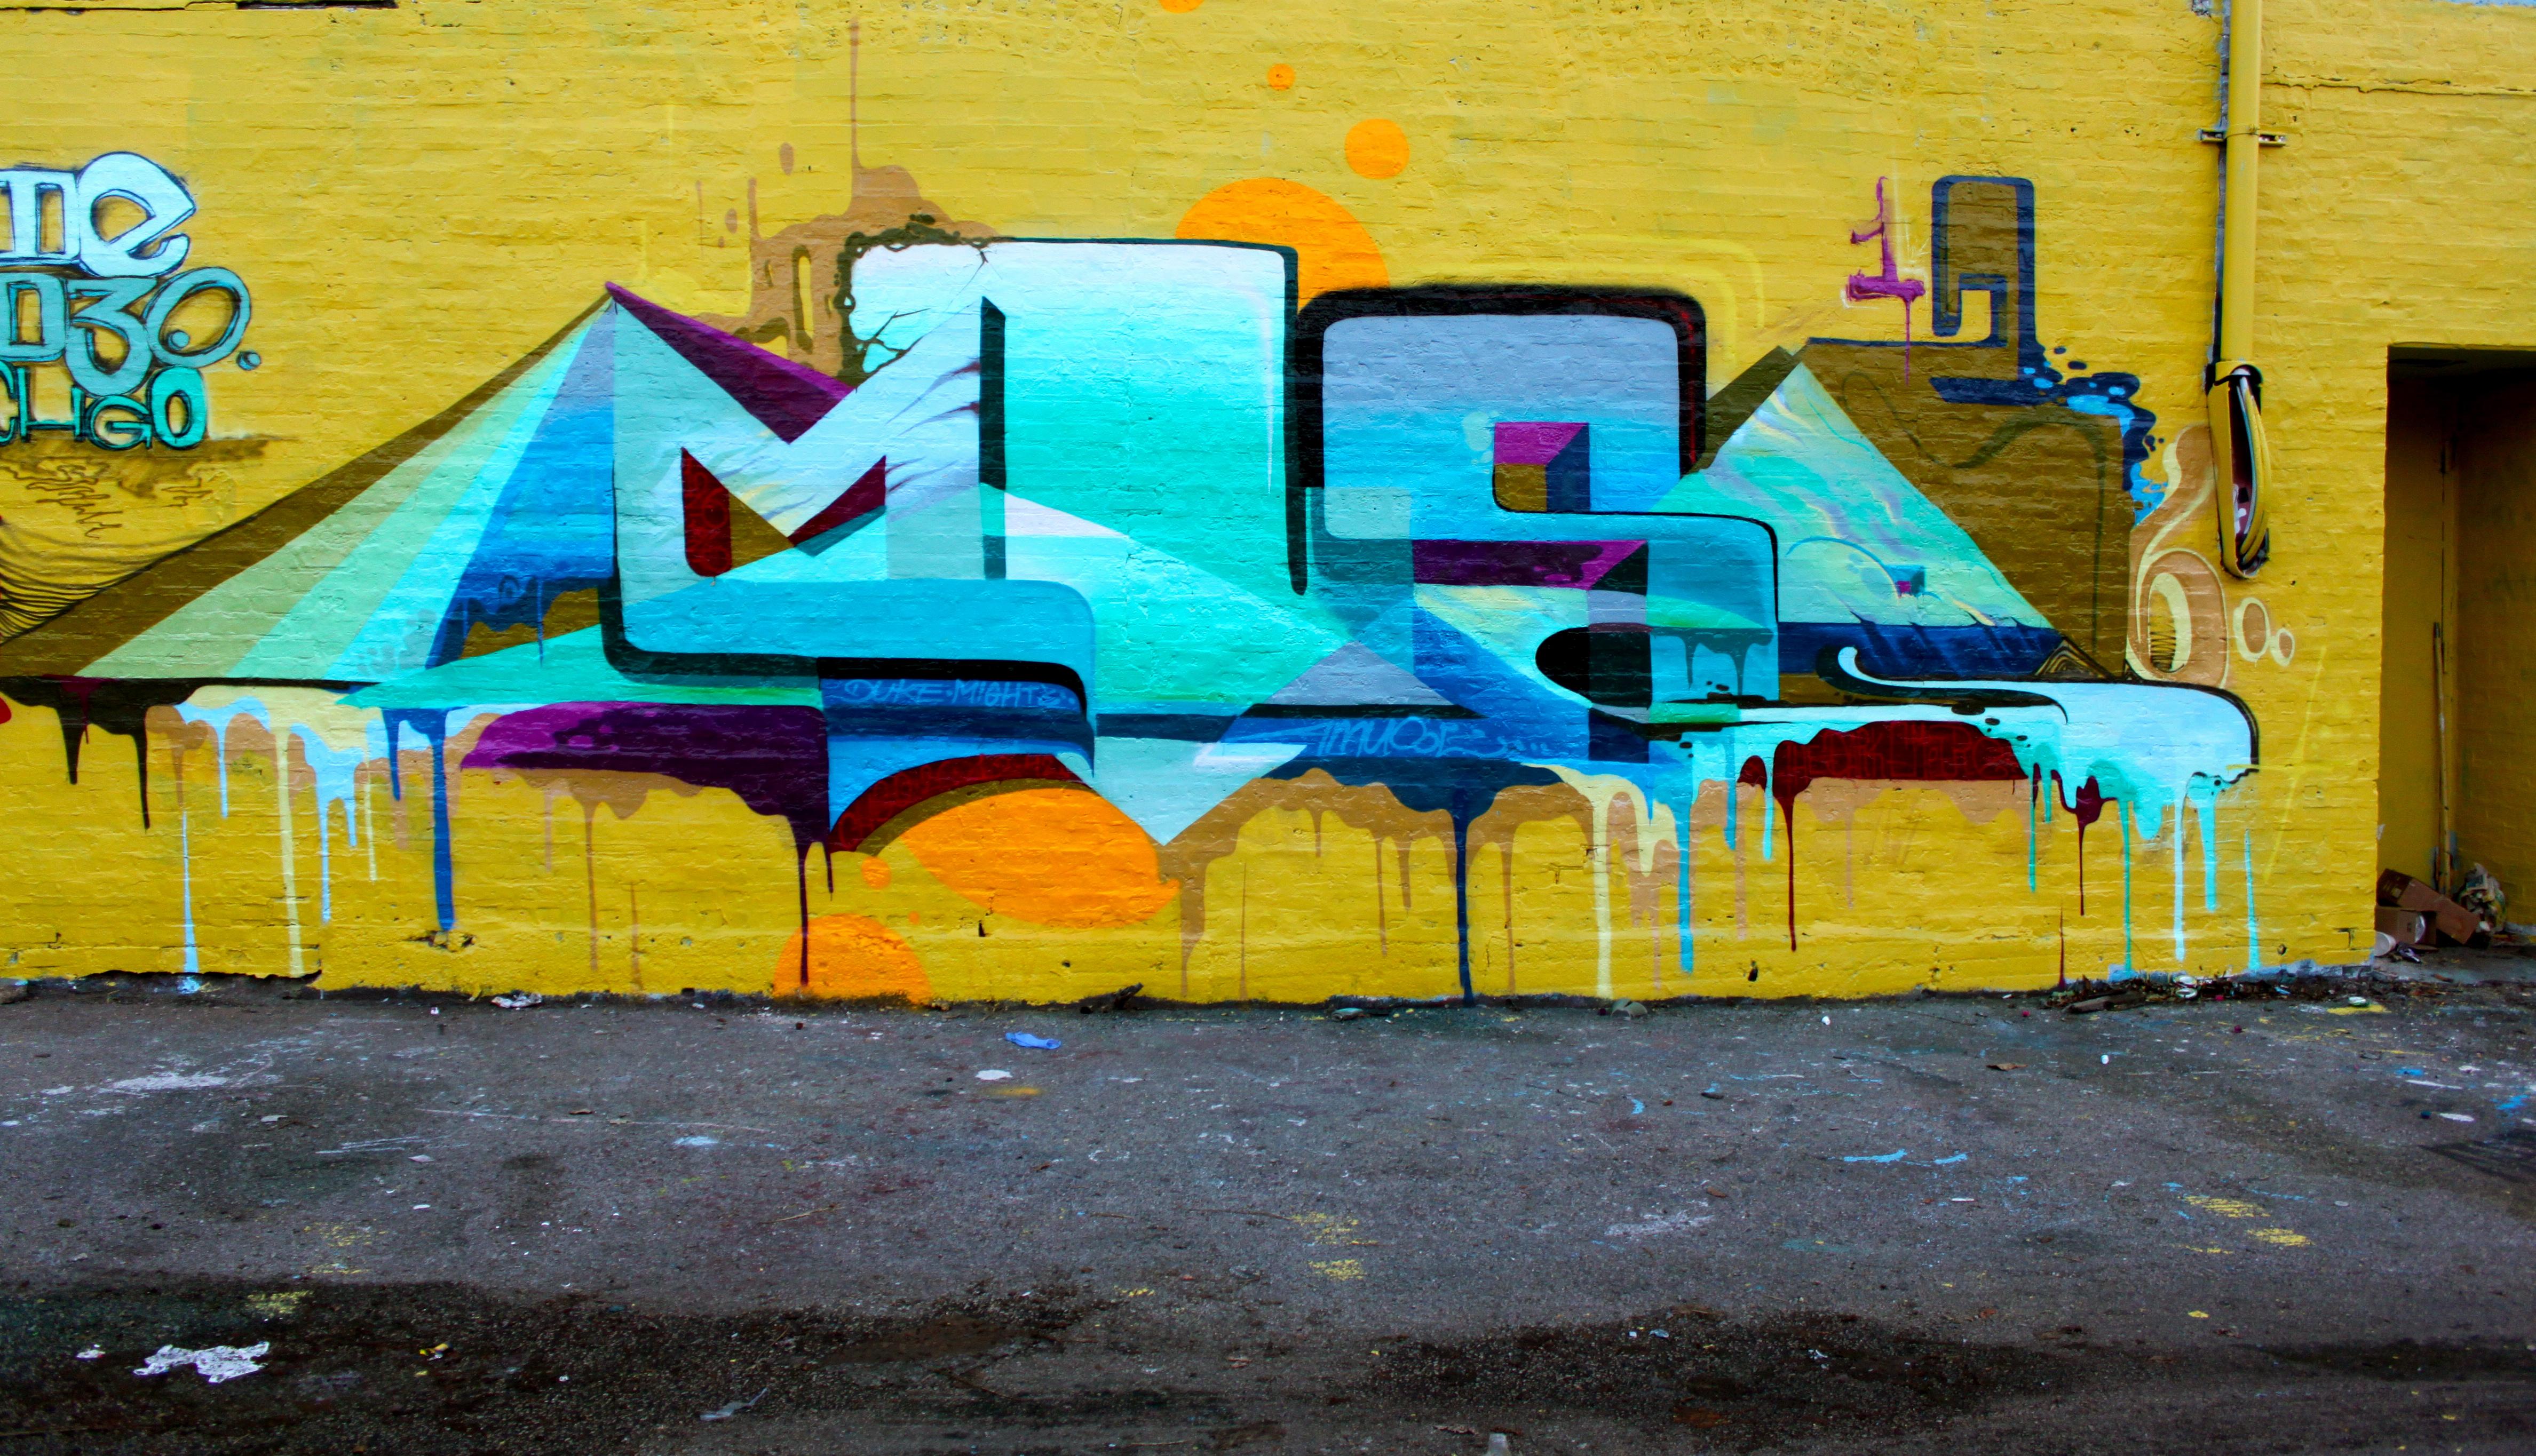 Wallpaper Painting Wall Yellow Graffiti Street Art Chicago